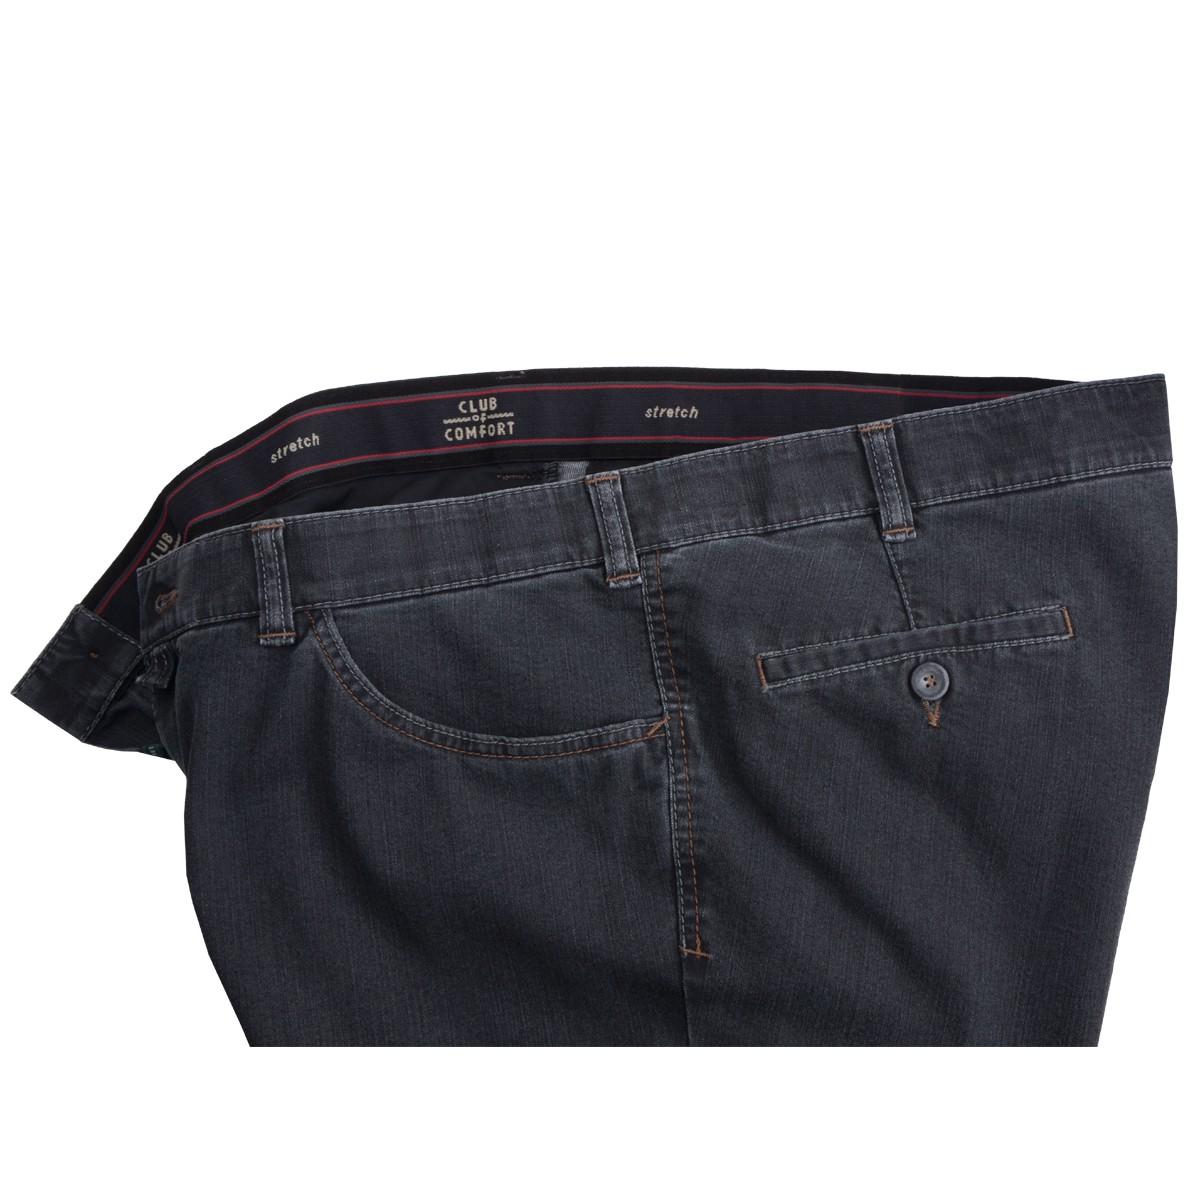 club of comfort dunkelgraue jeans liam bergr e. Black Bedroom Furniture Sets. Home Design Ideas